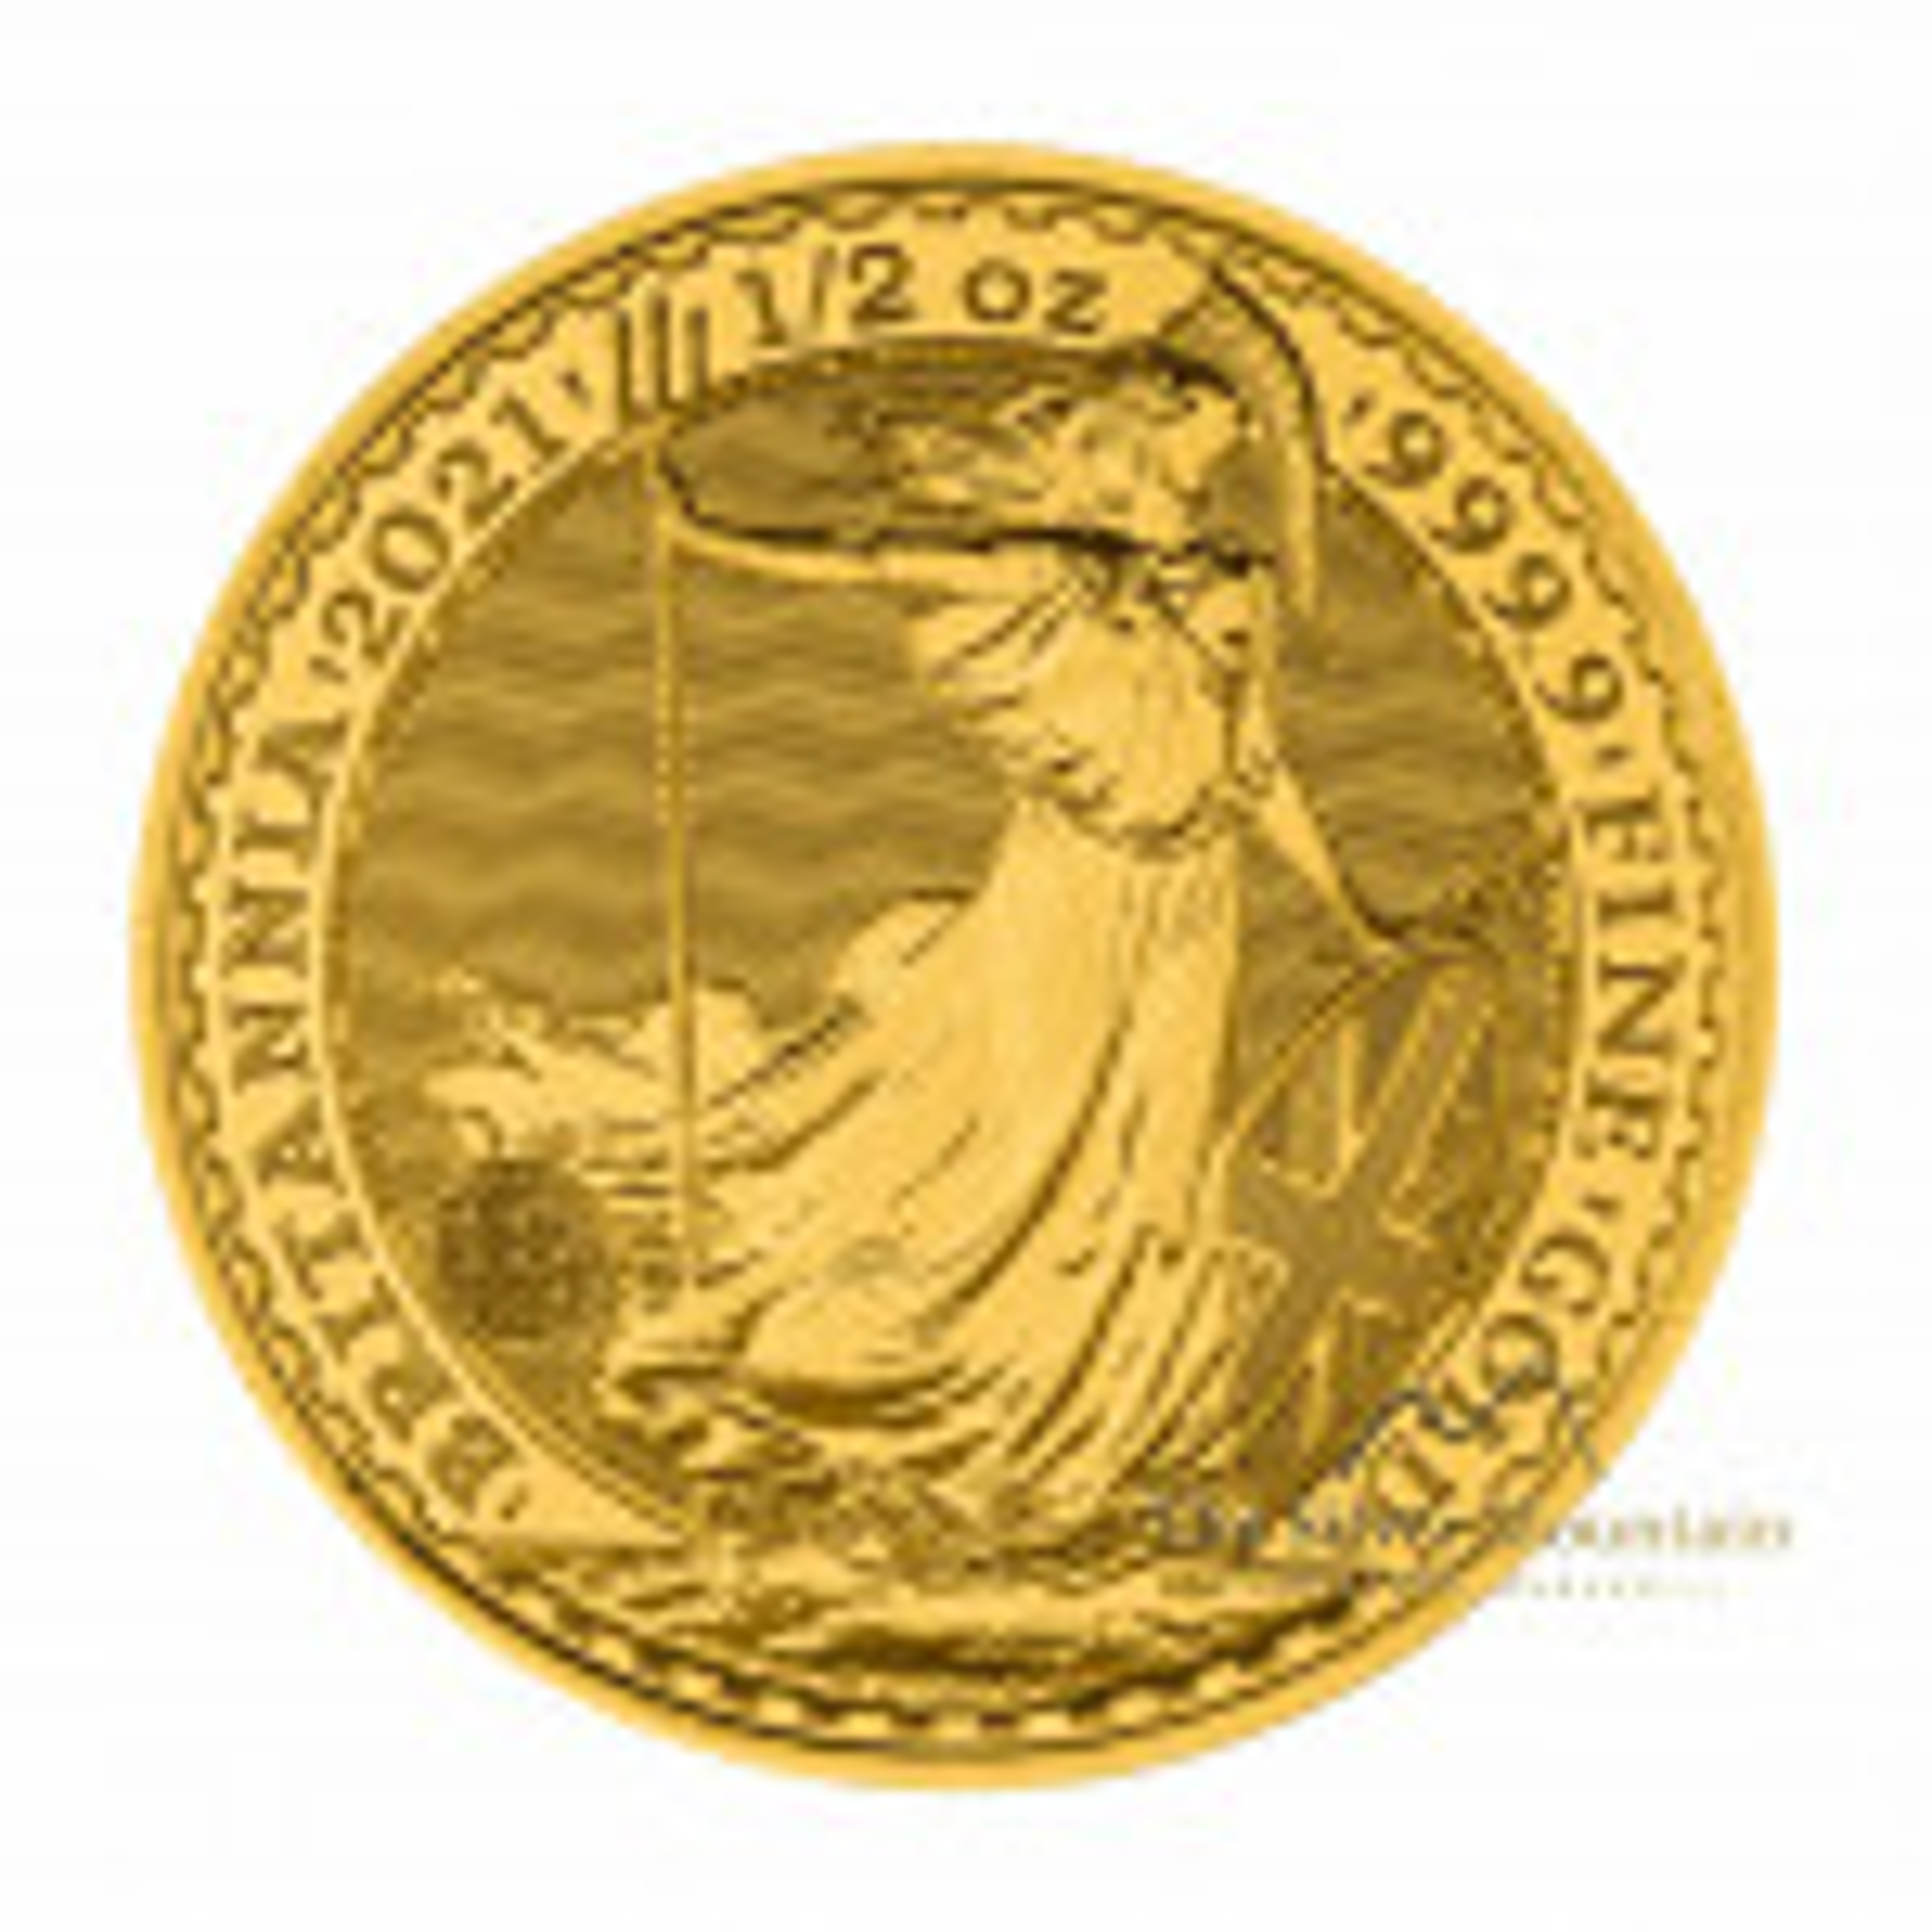 1/2 troy ounce gold coin Britannia 2021